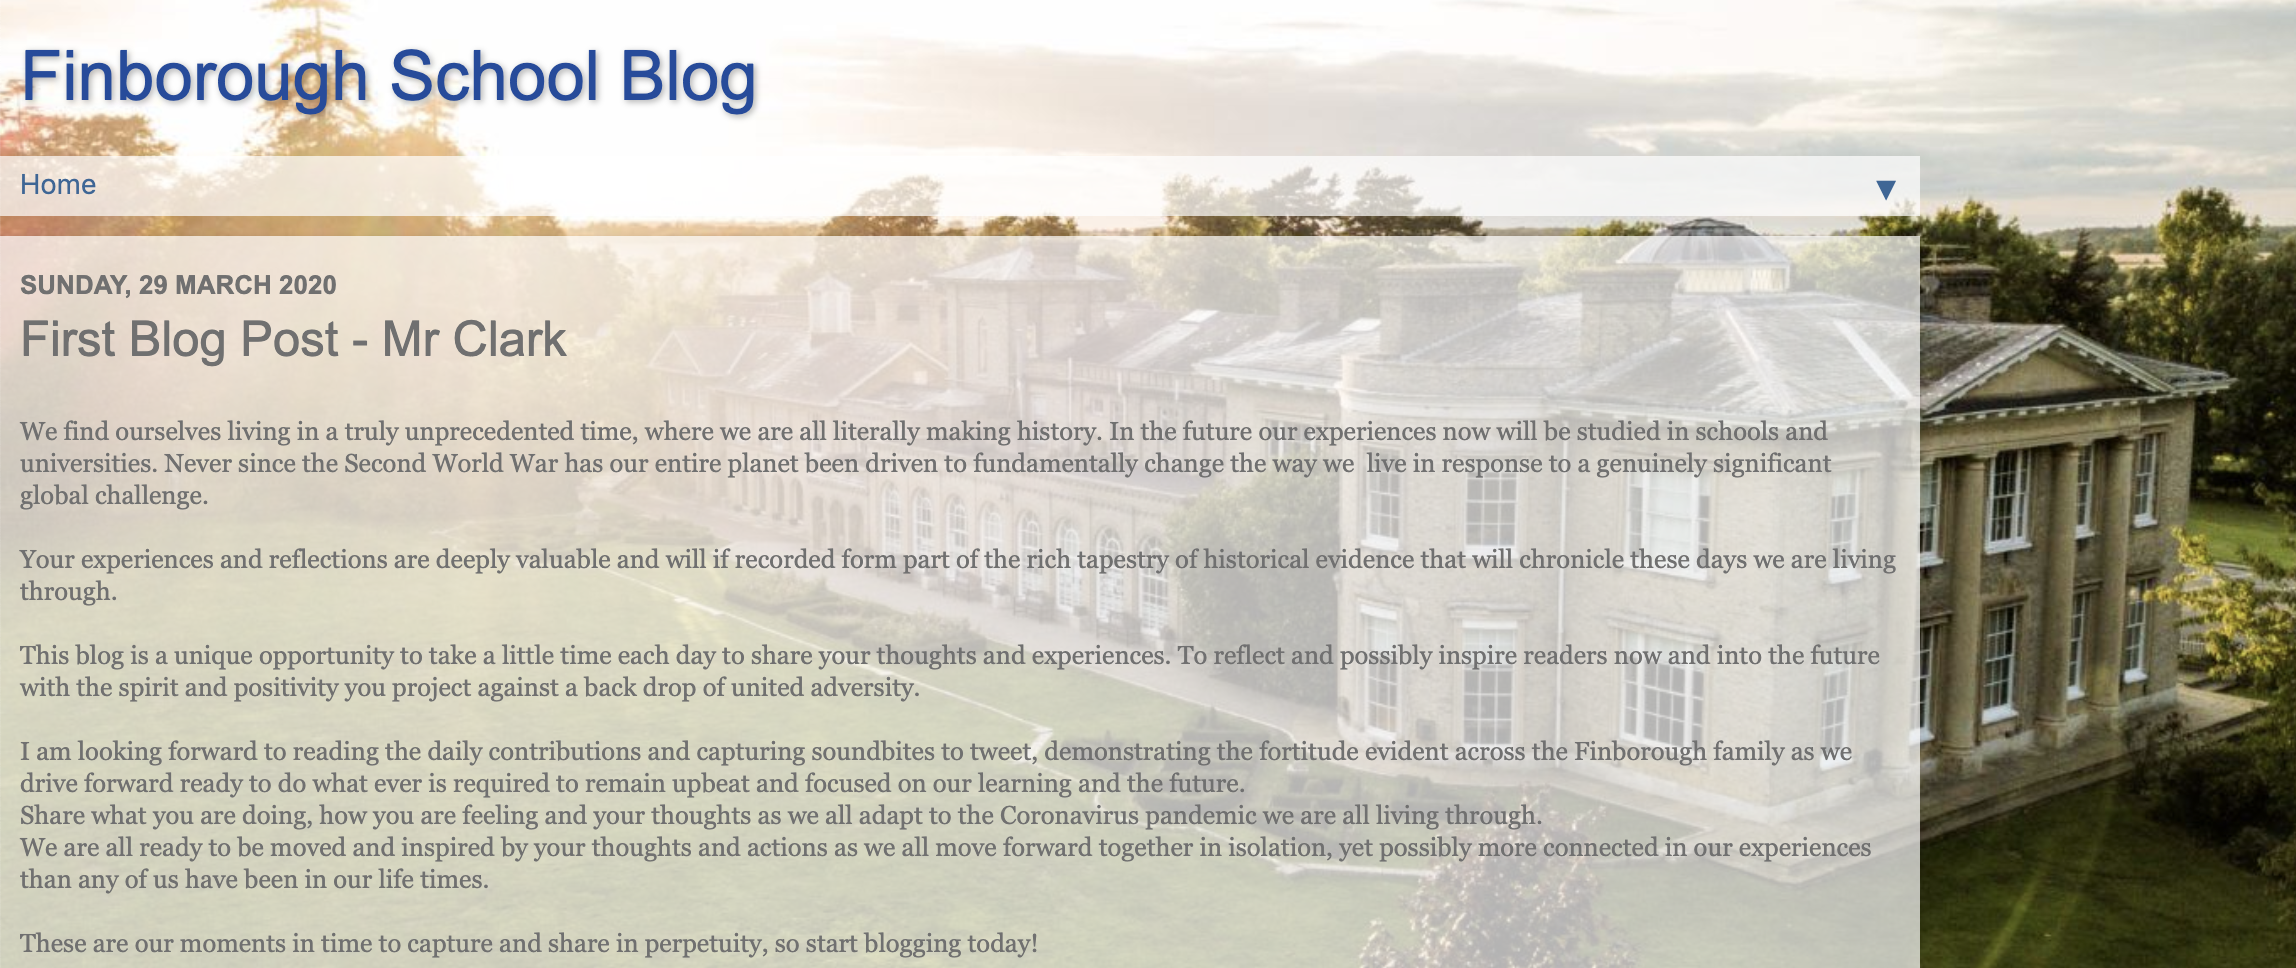 Finborough School Blog